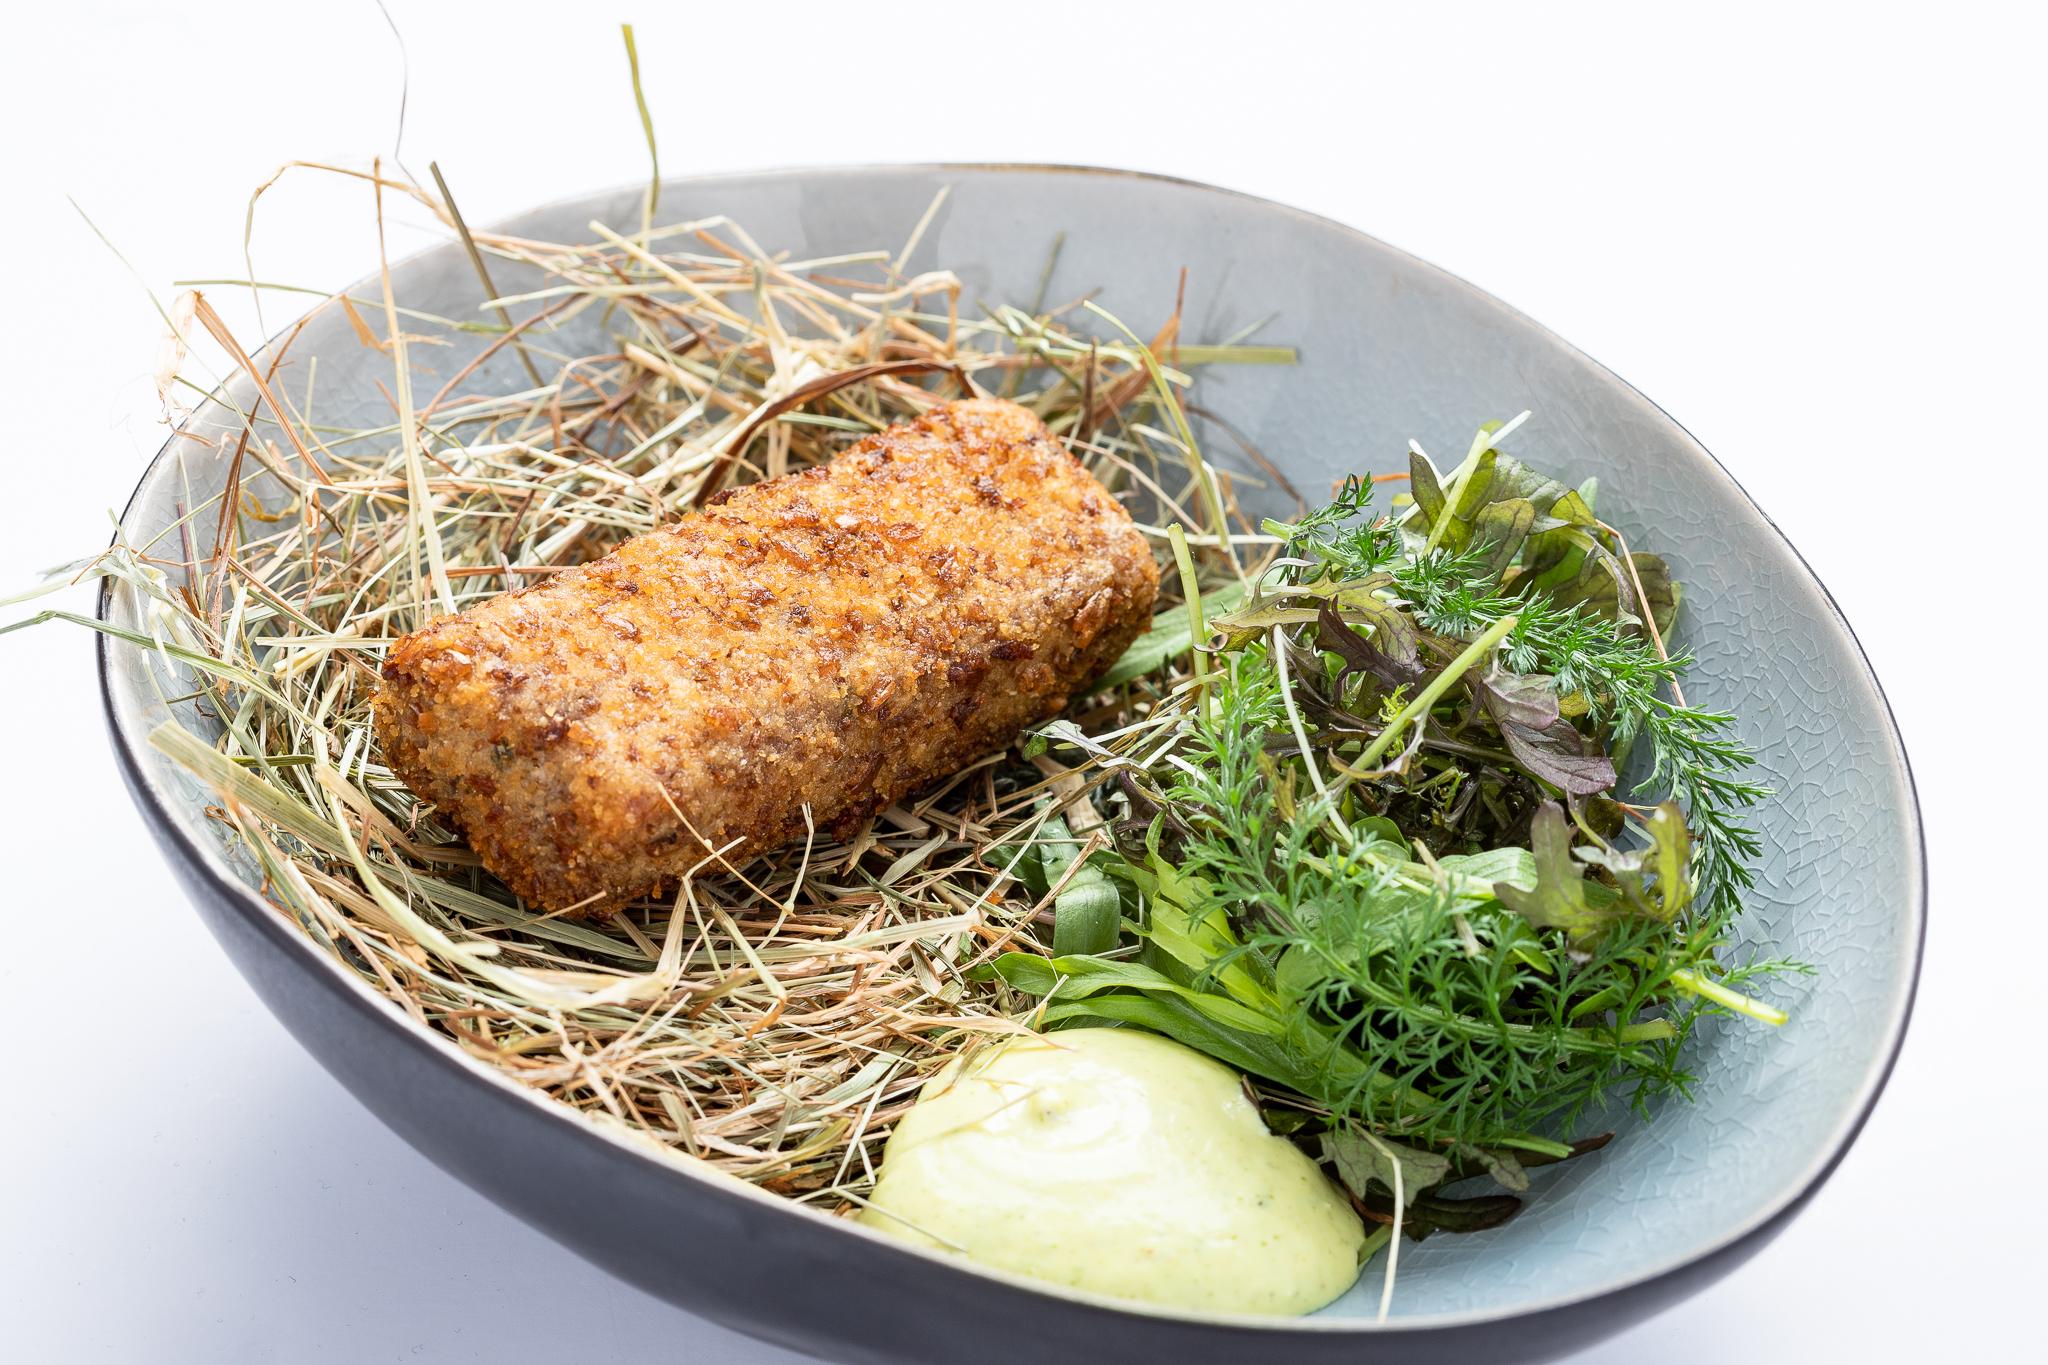 Vleeskroket, béarnaisecrème, kruidenslaatje - GOFFIN *